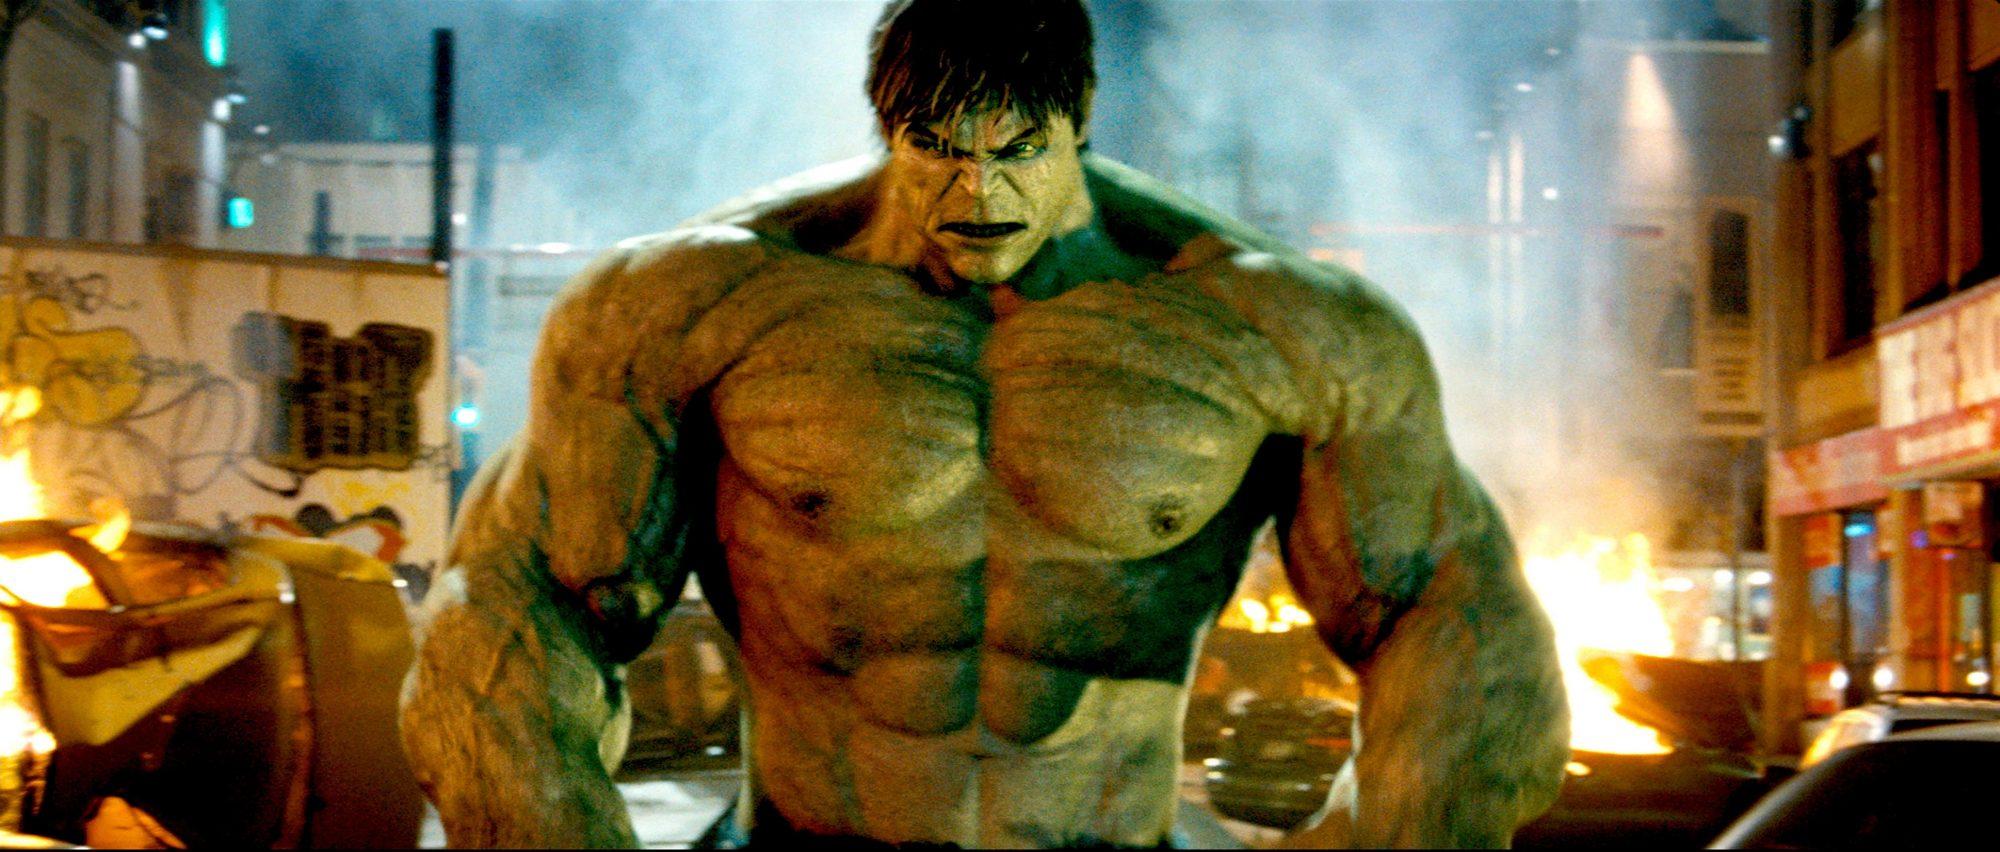 The Incredible Hulk (2008)Hulk